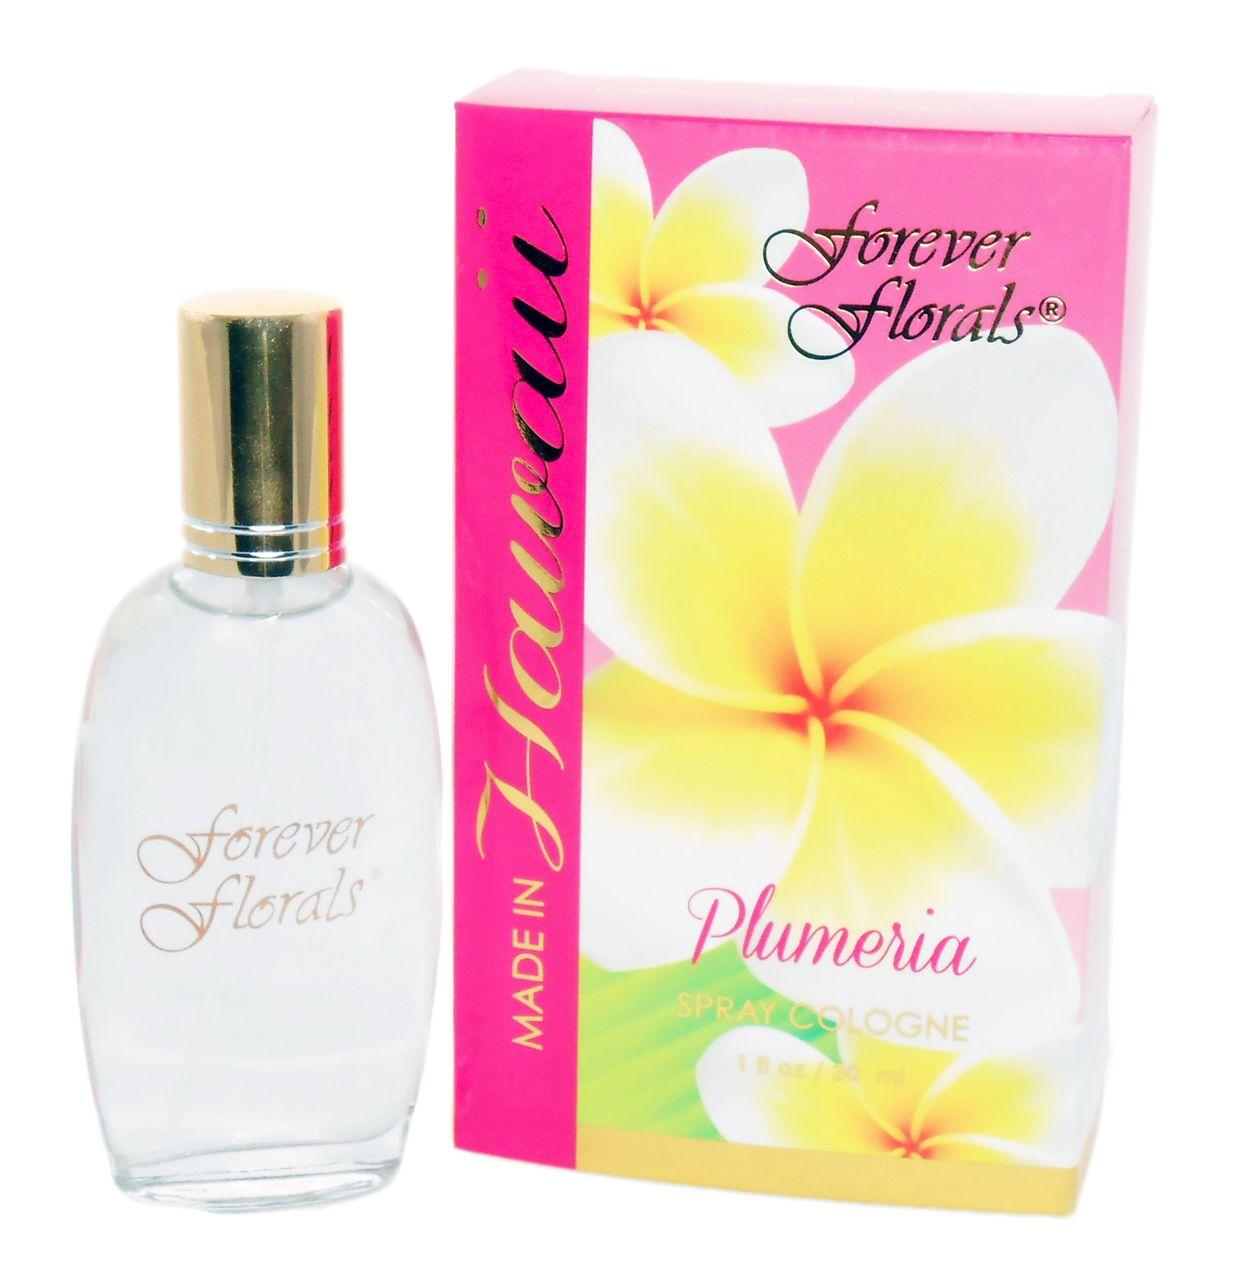 1oz Plumeria Cologne Forever Florals Perfume Plumeria Fragrance